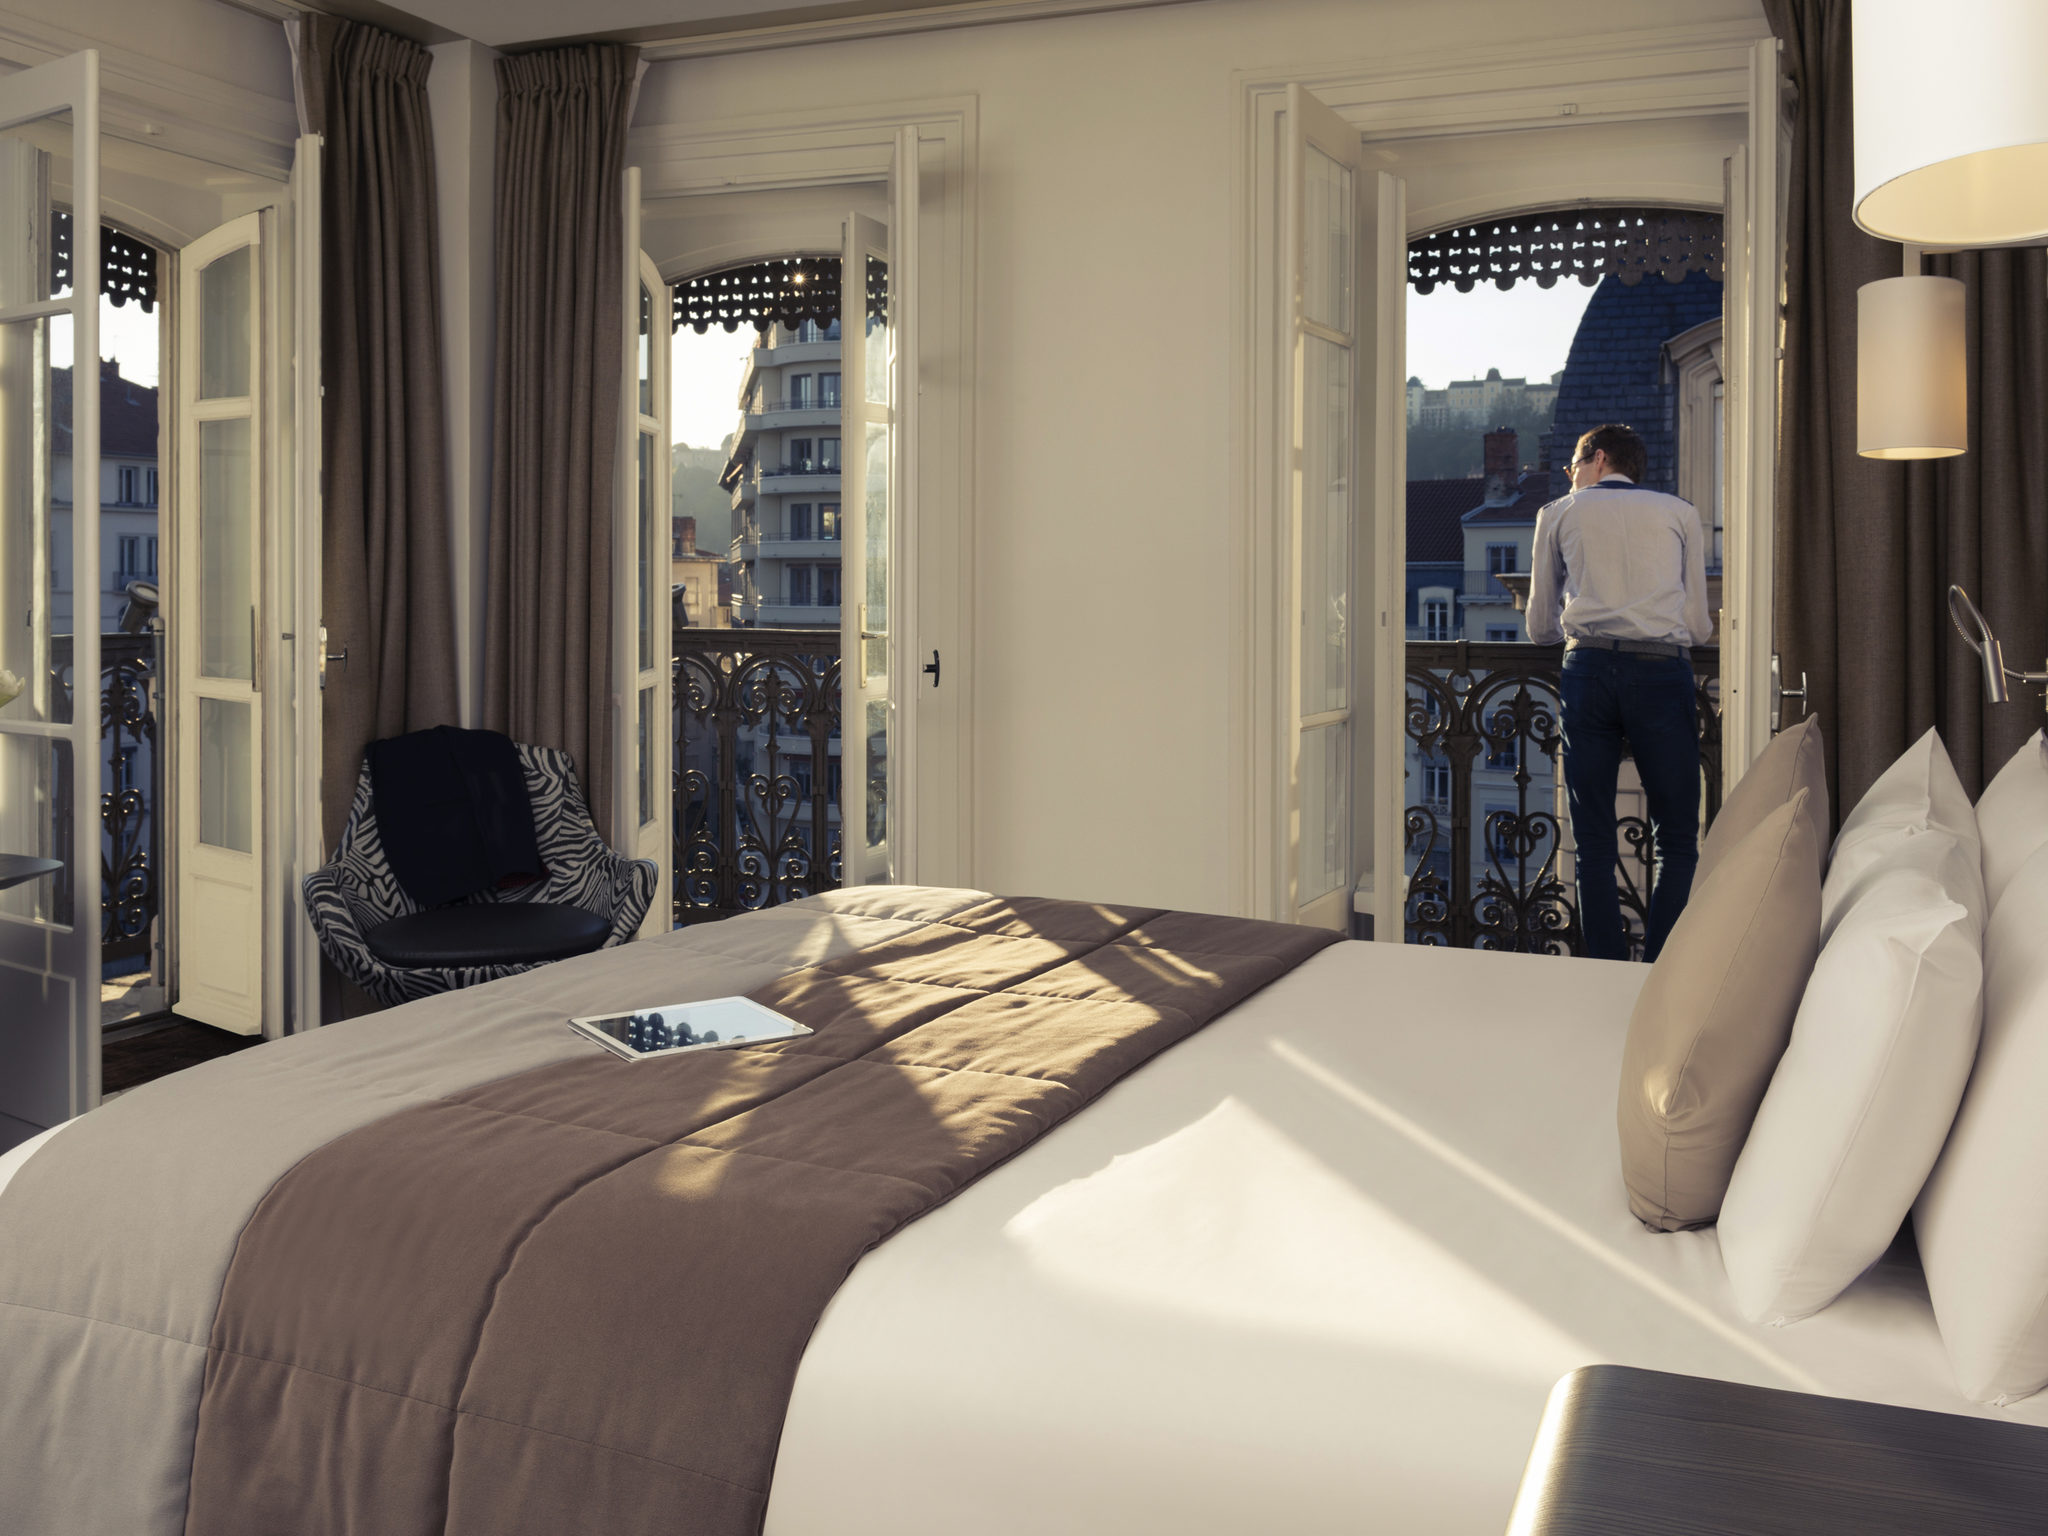 Hotel – Hotel Mercure Lyon Centre Beaux Arts